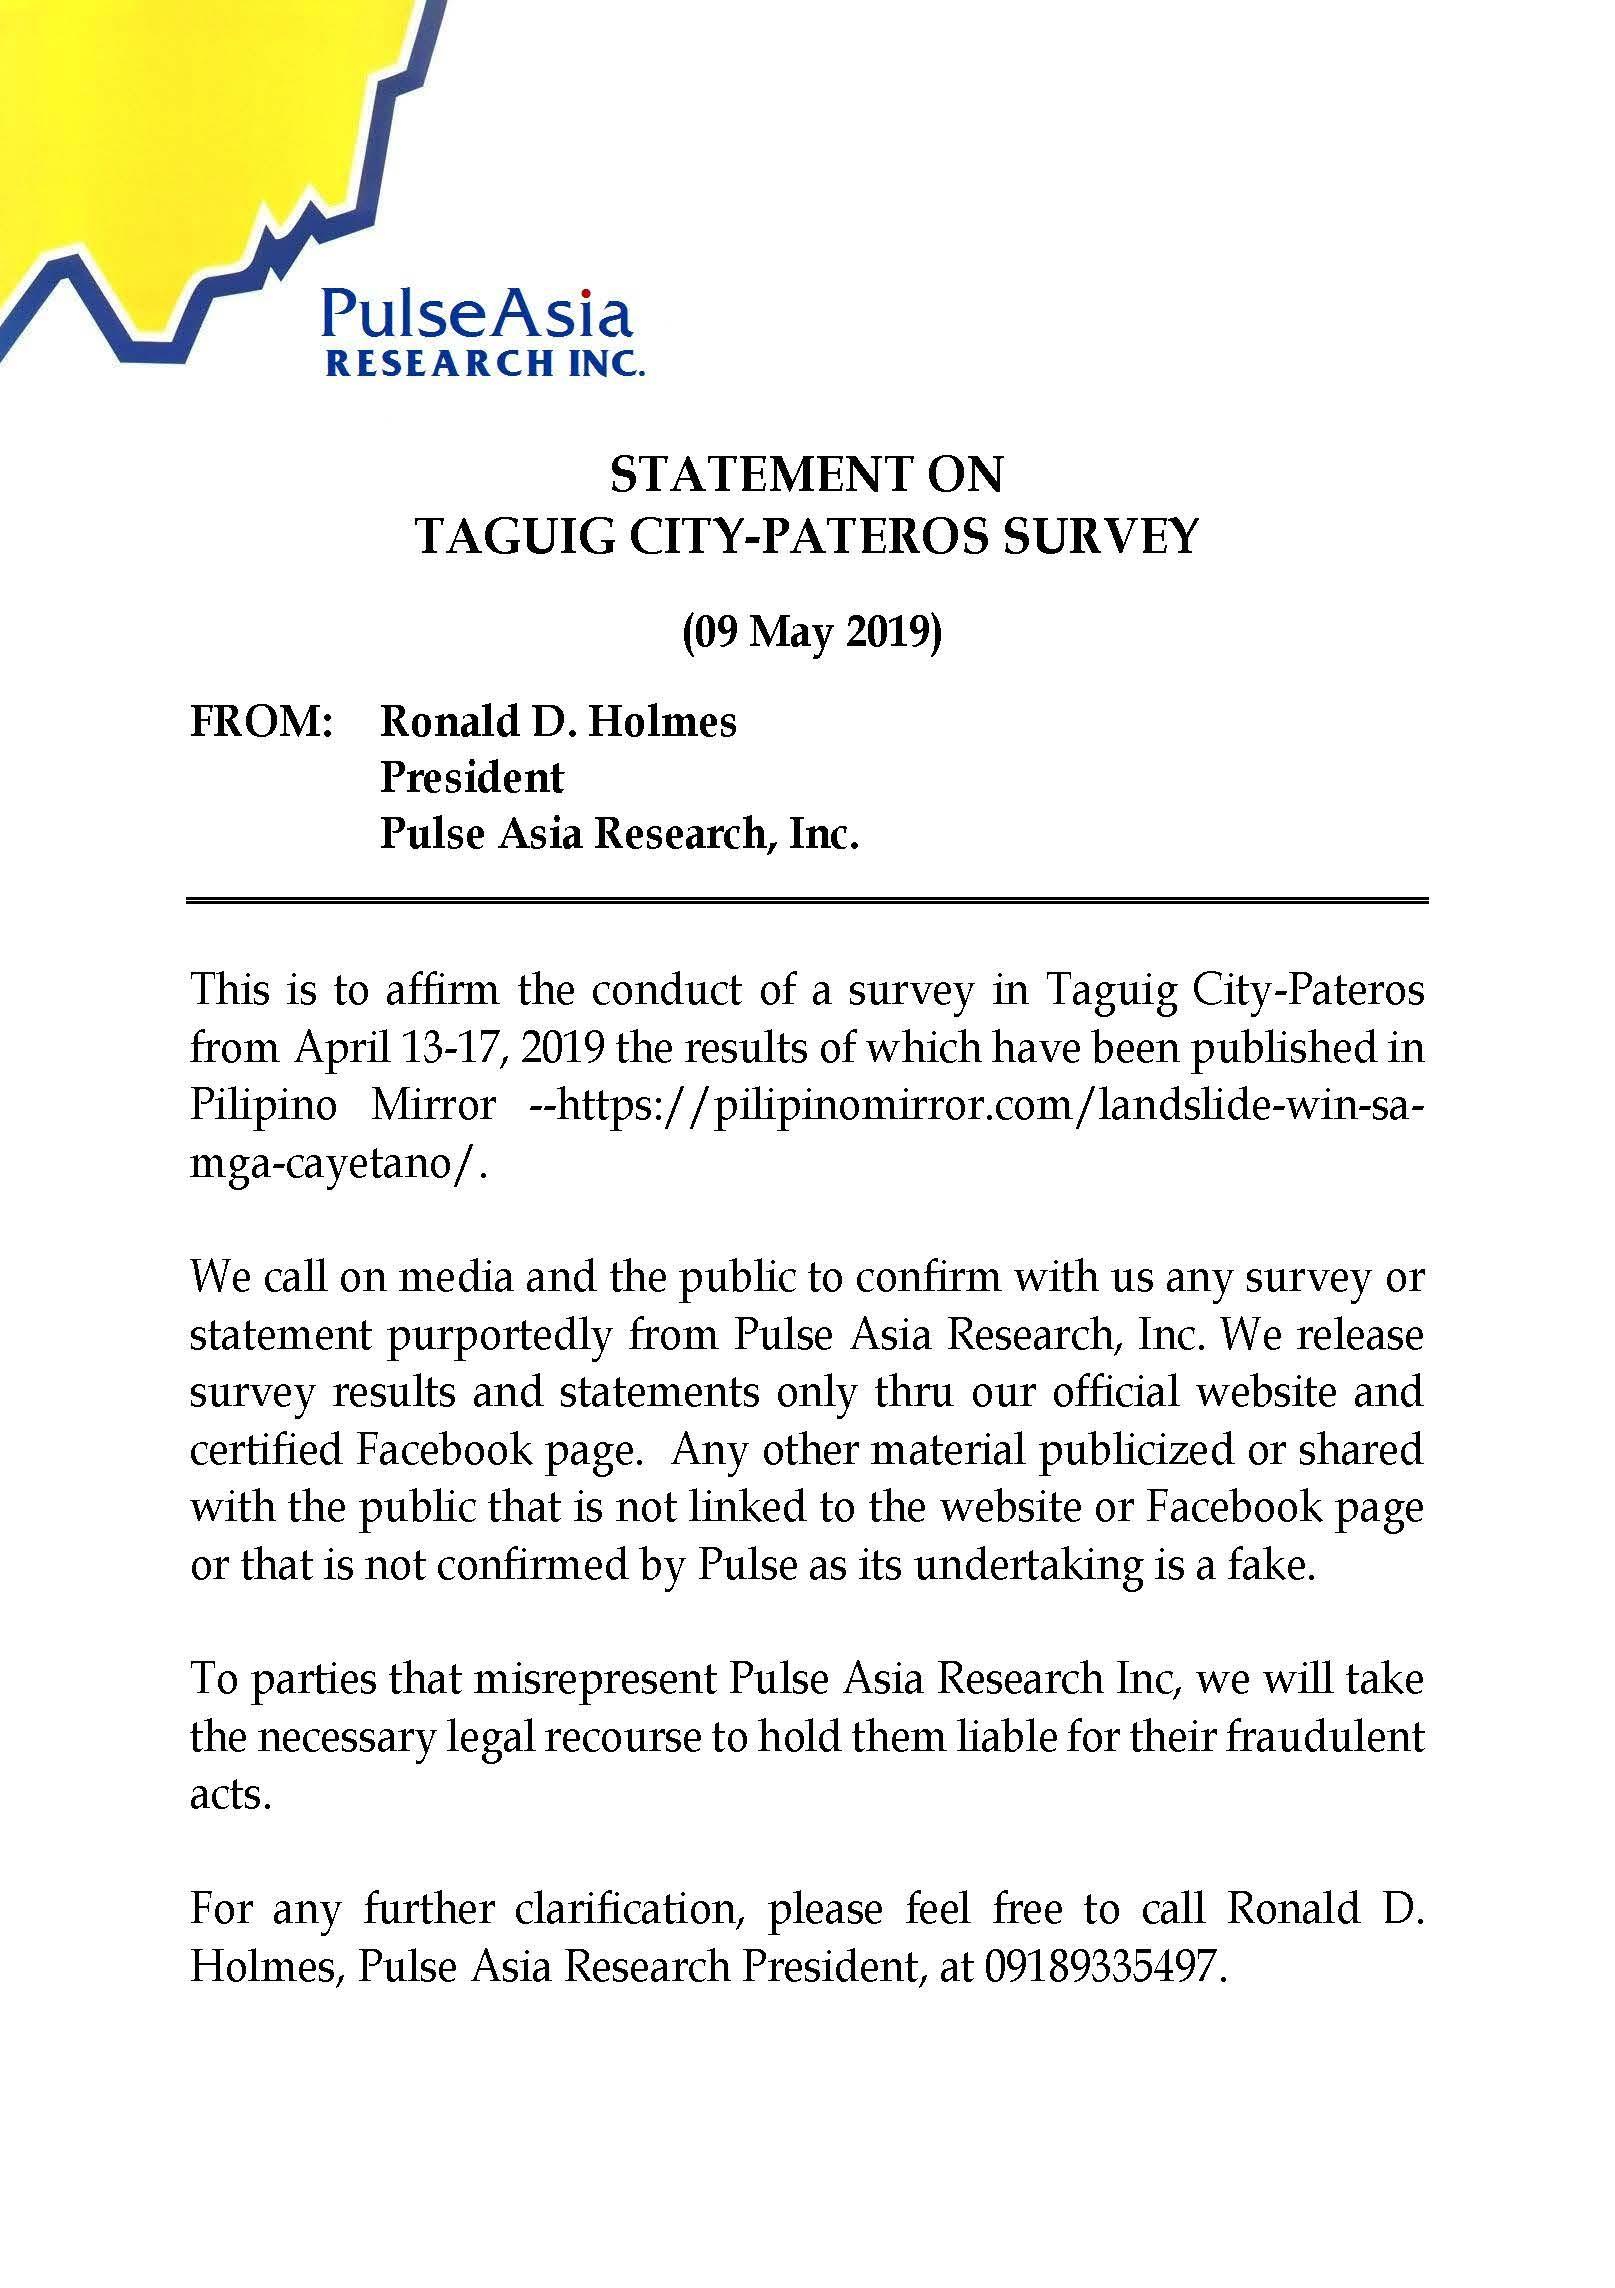 Statement on Taguig City-Pateros Survey